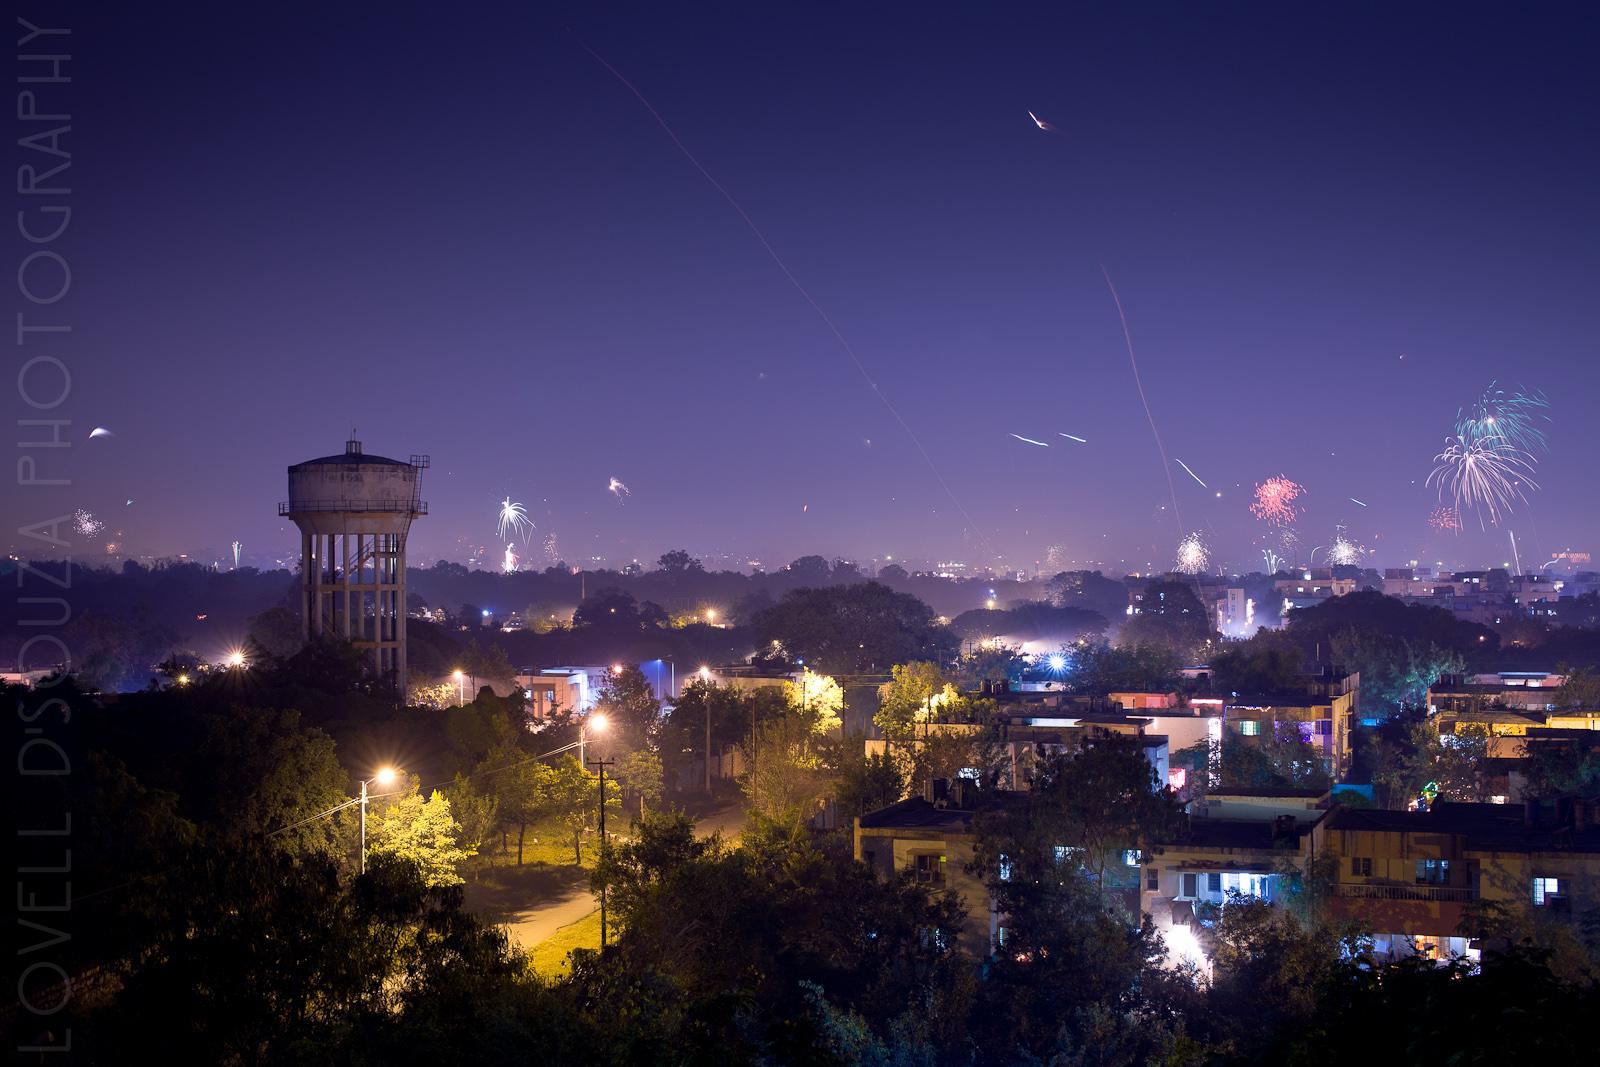 Diwali Cityscape - Hyderabad